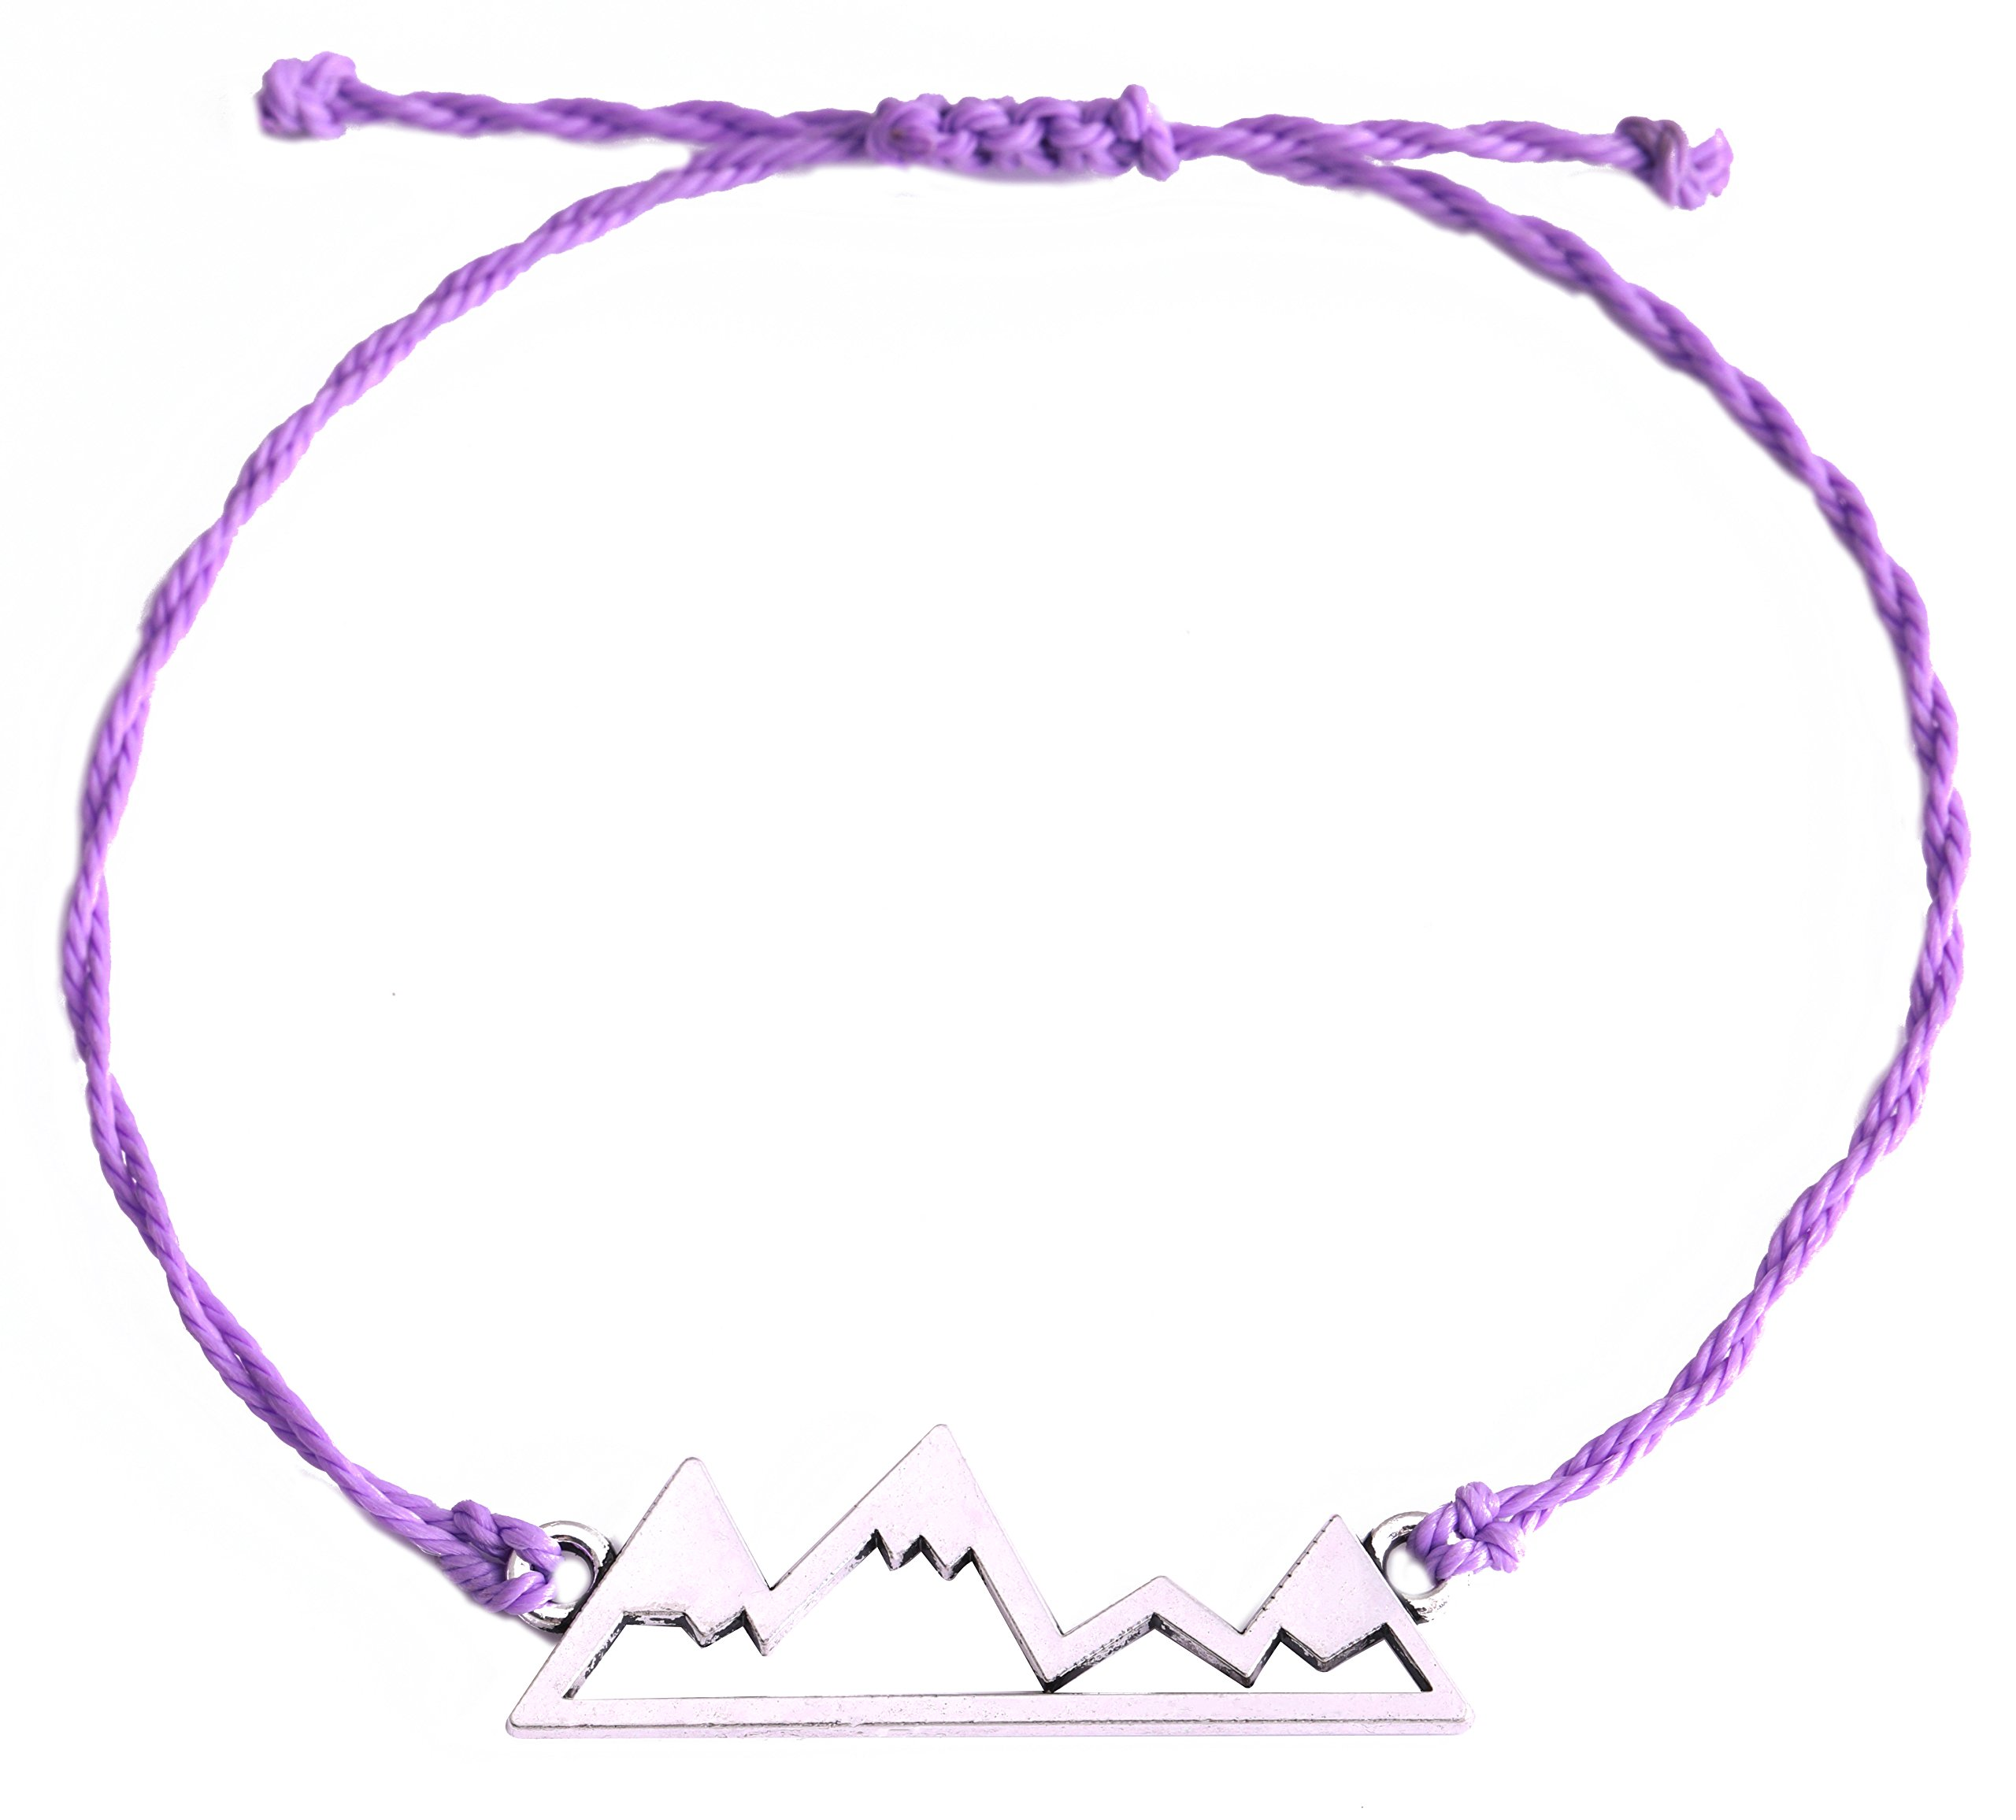 EUEAVAN Exqusite Nature Snow Mountains Hiking Adventure Travel Pendant Wax Cord Adjustable Bracelet (Purple)